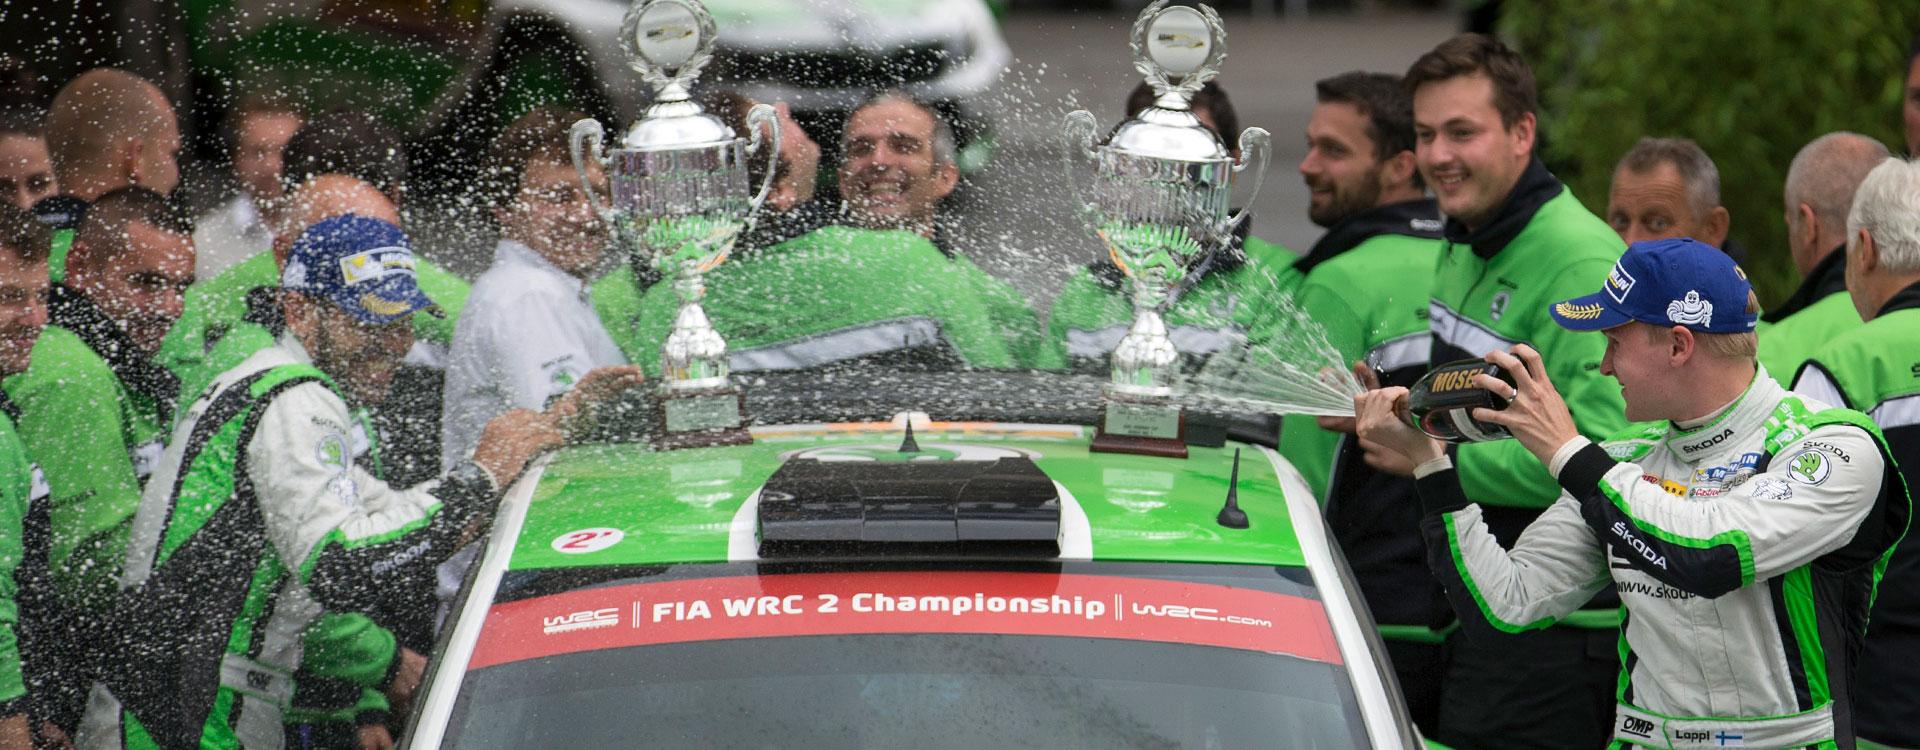 ŠKODA celebrates 1-2-3-4 result at the Rally Germany